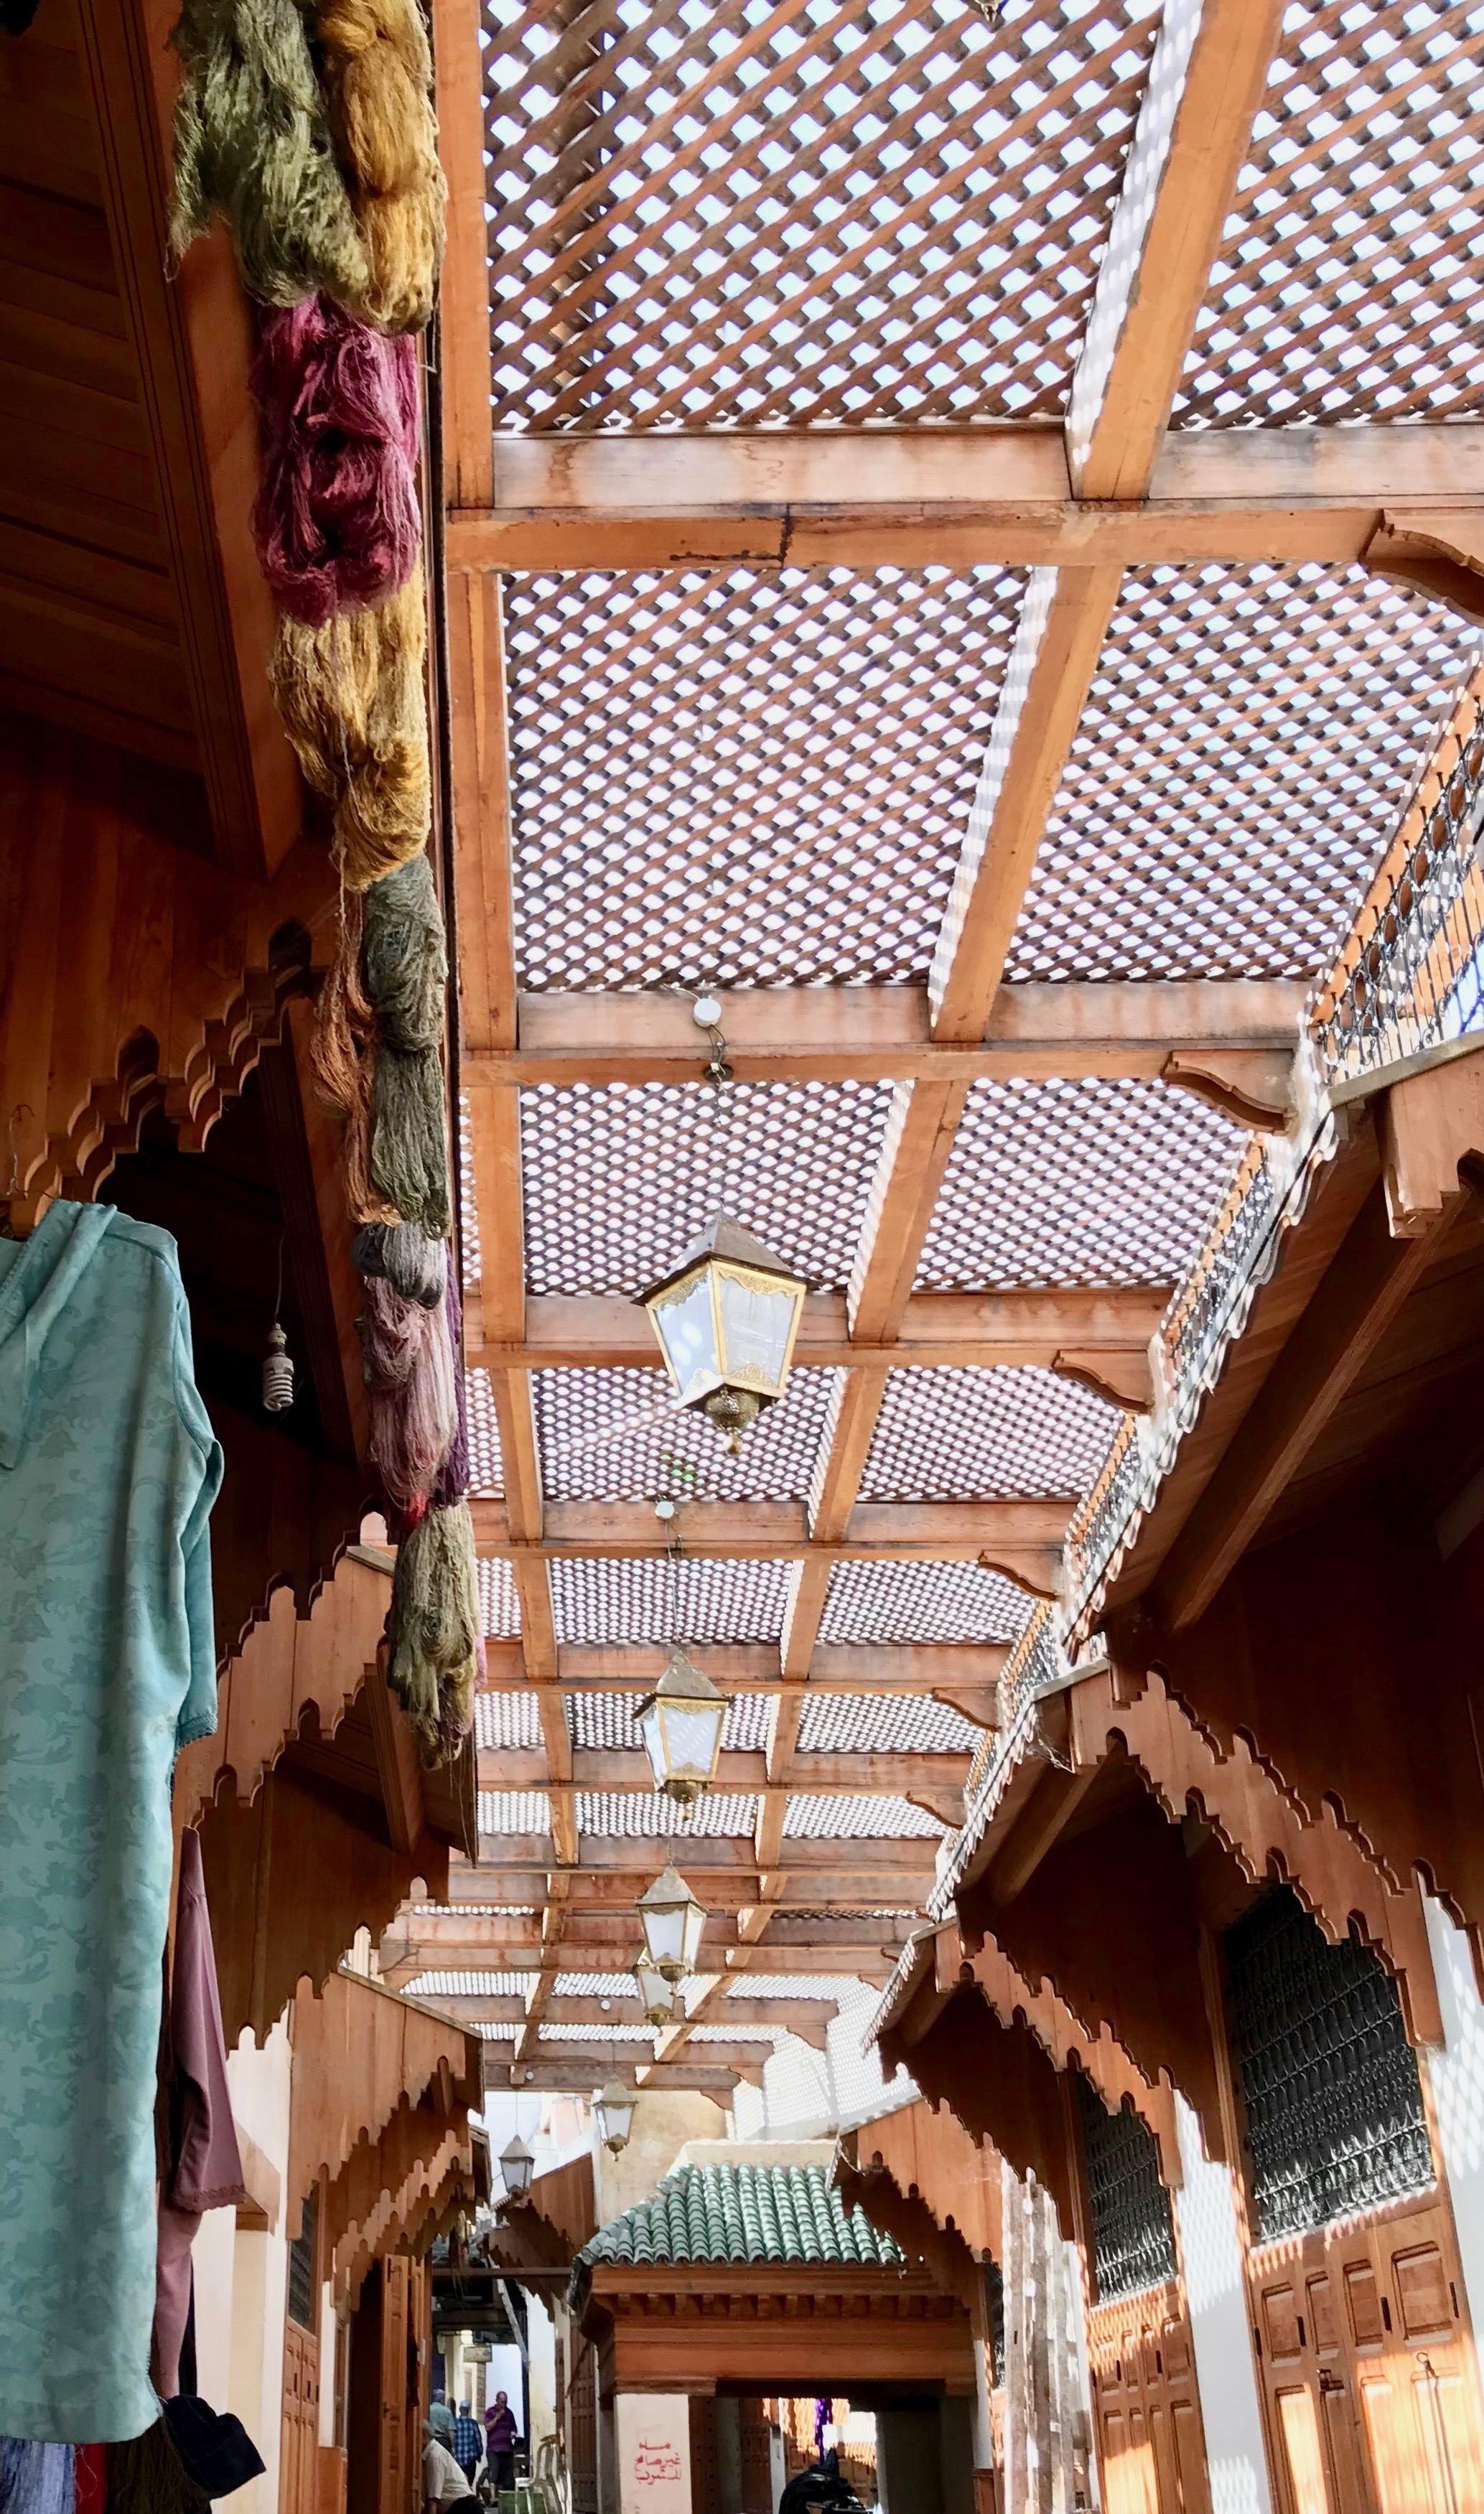 Textiles under a breezy roof